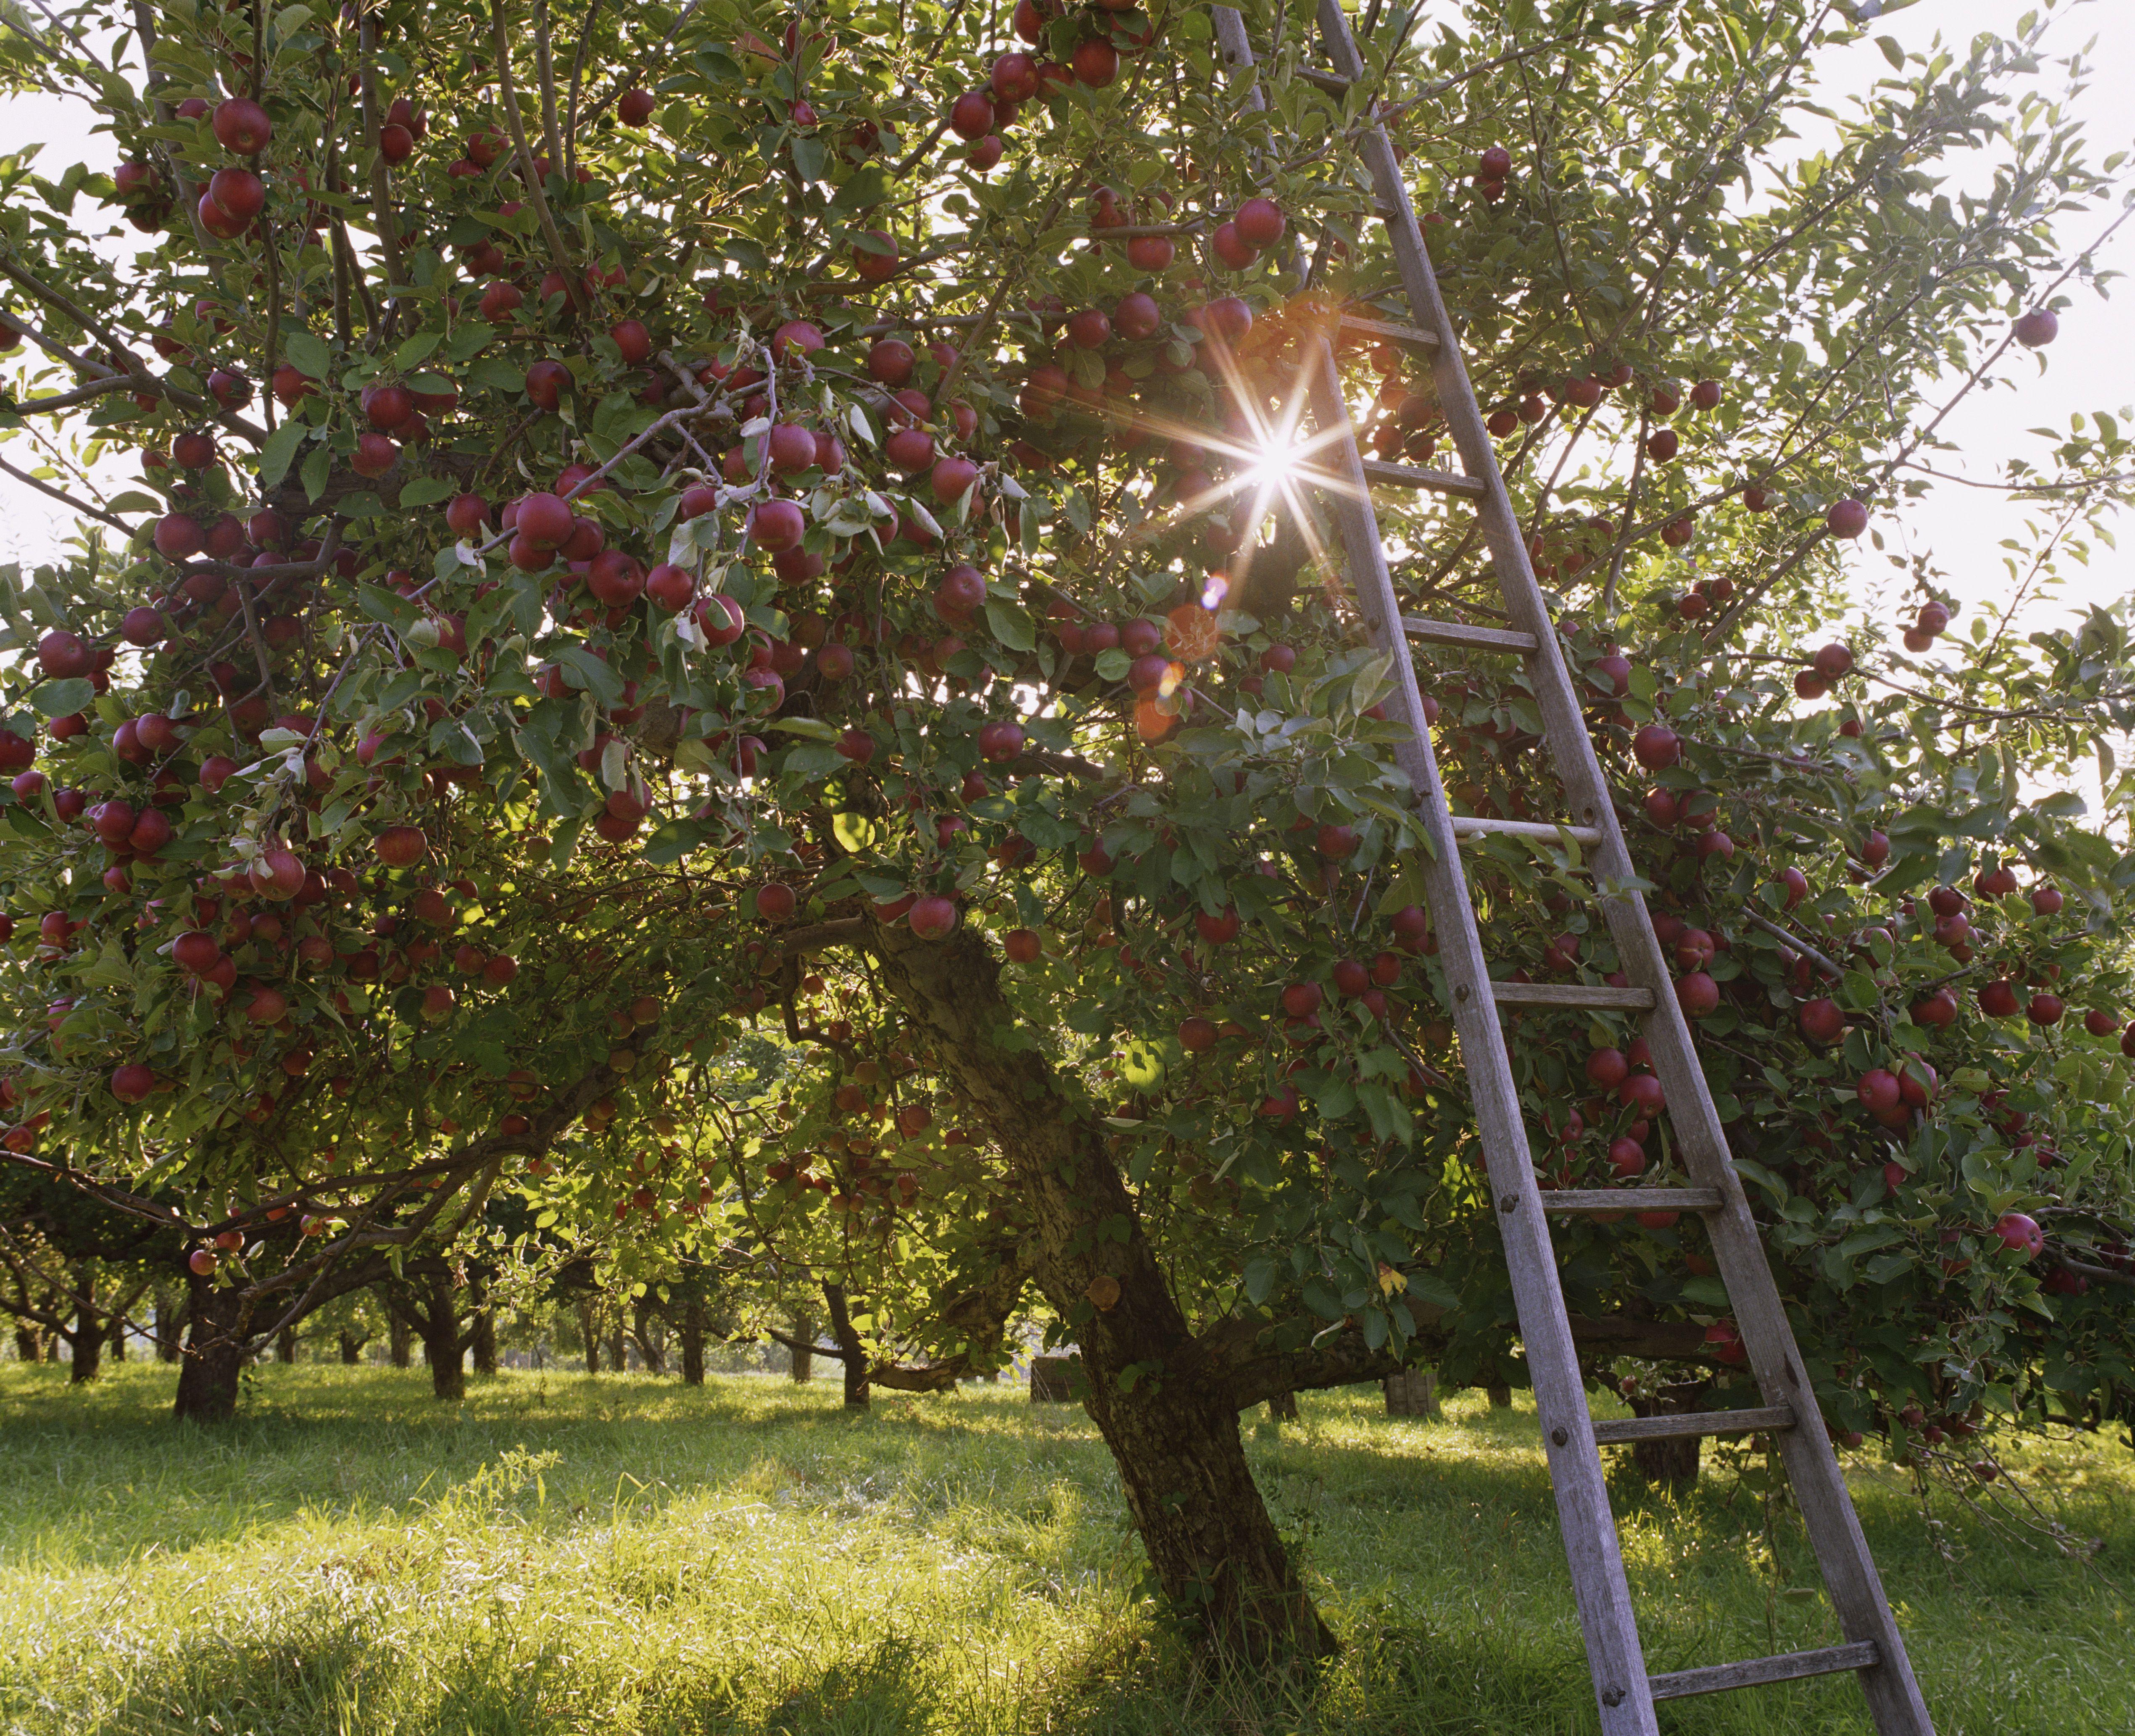 How To Prune An Overgrown Apple Tree